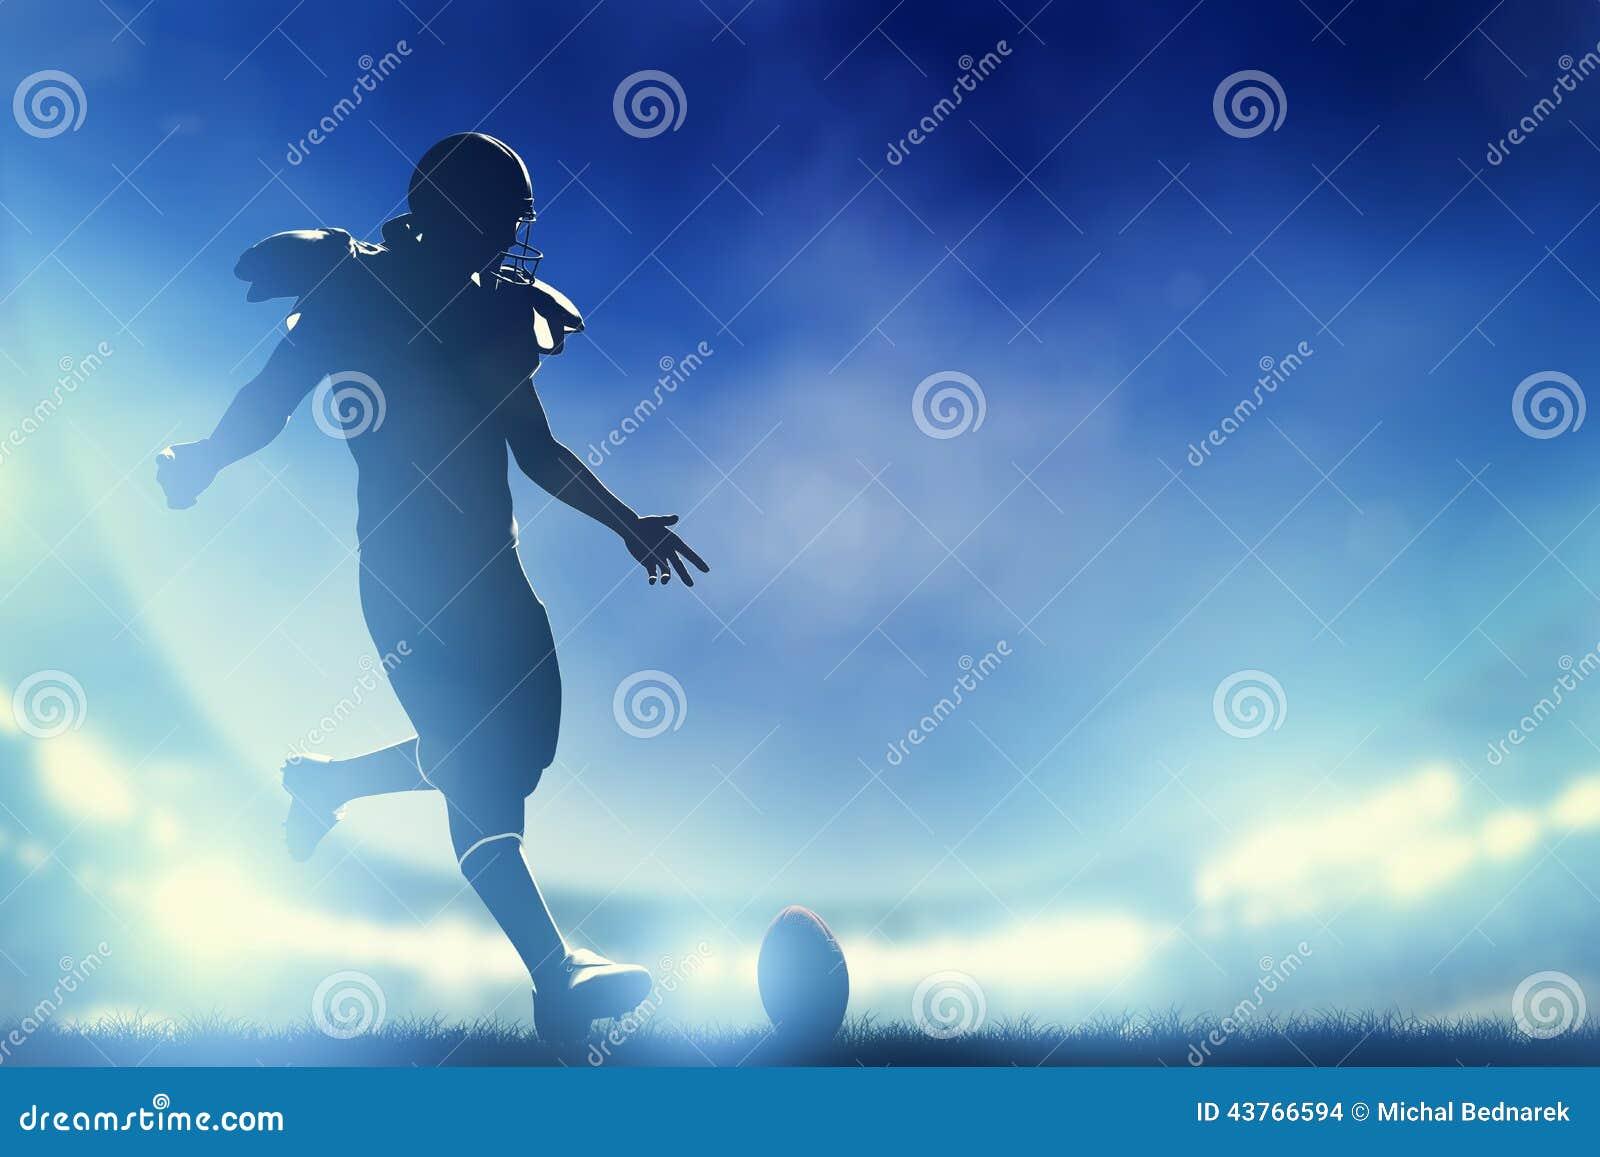 Amerikaanse voetbalster die de bal, aftrap schoppen